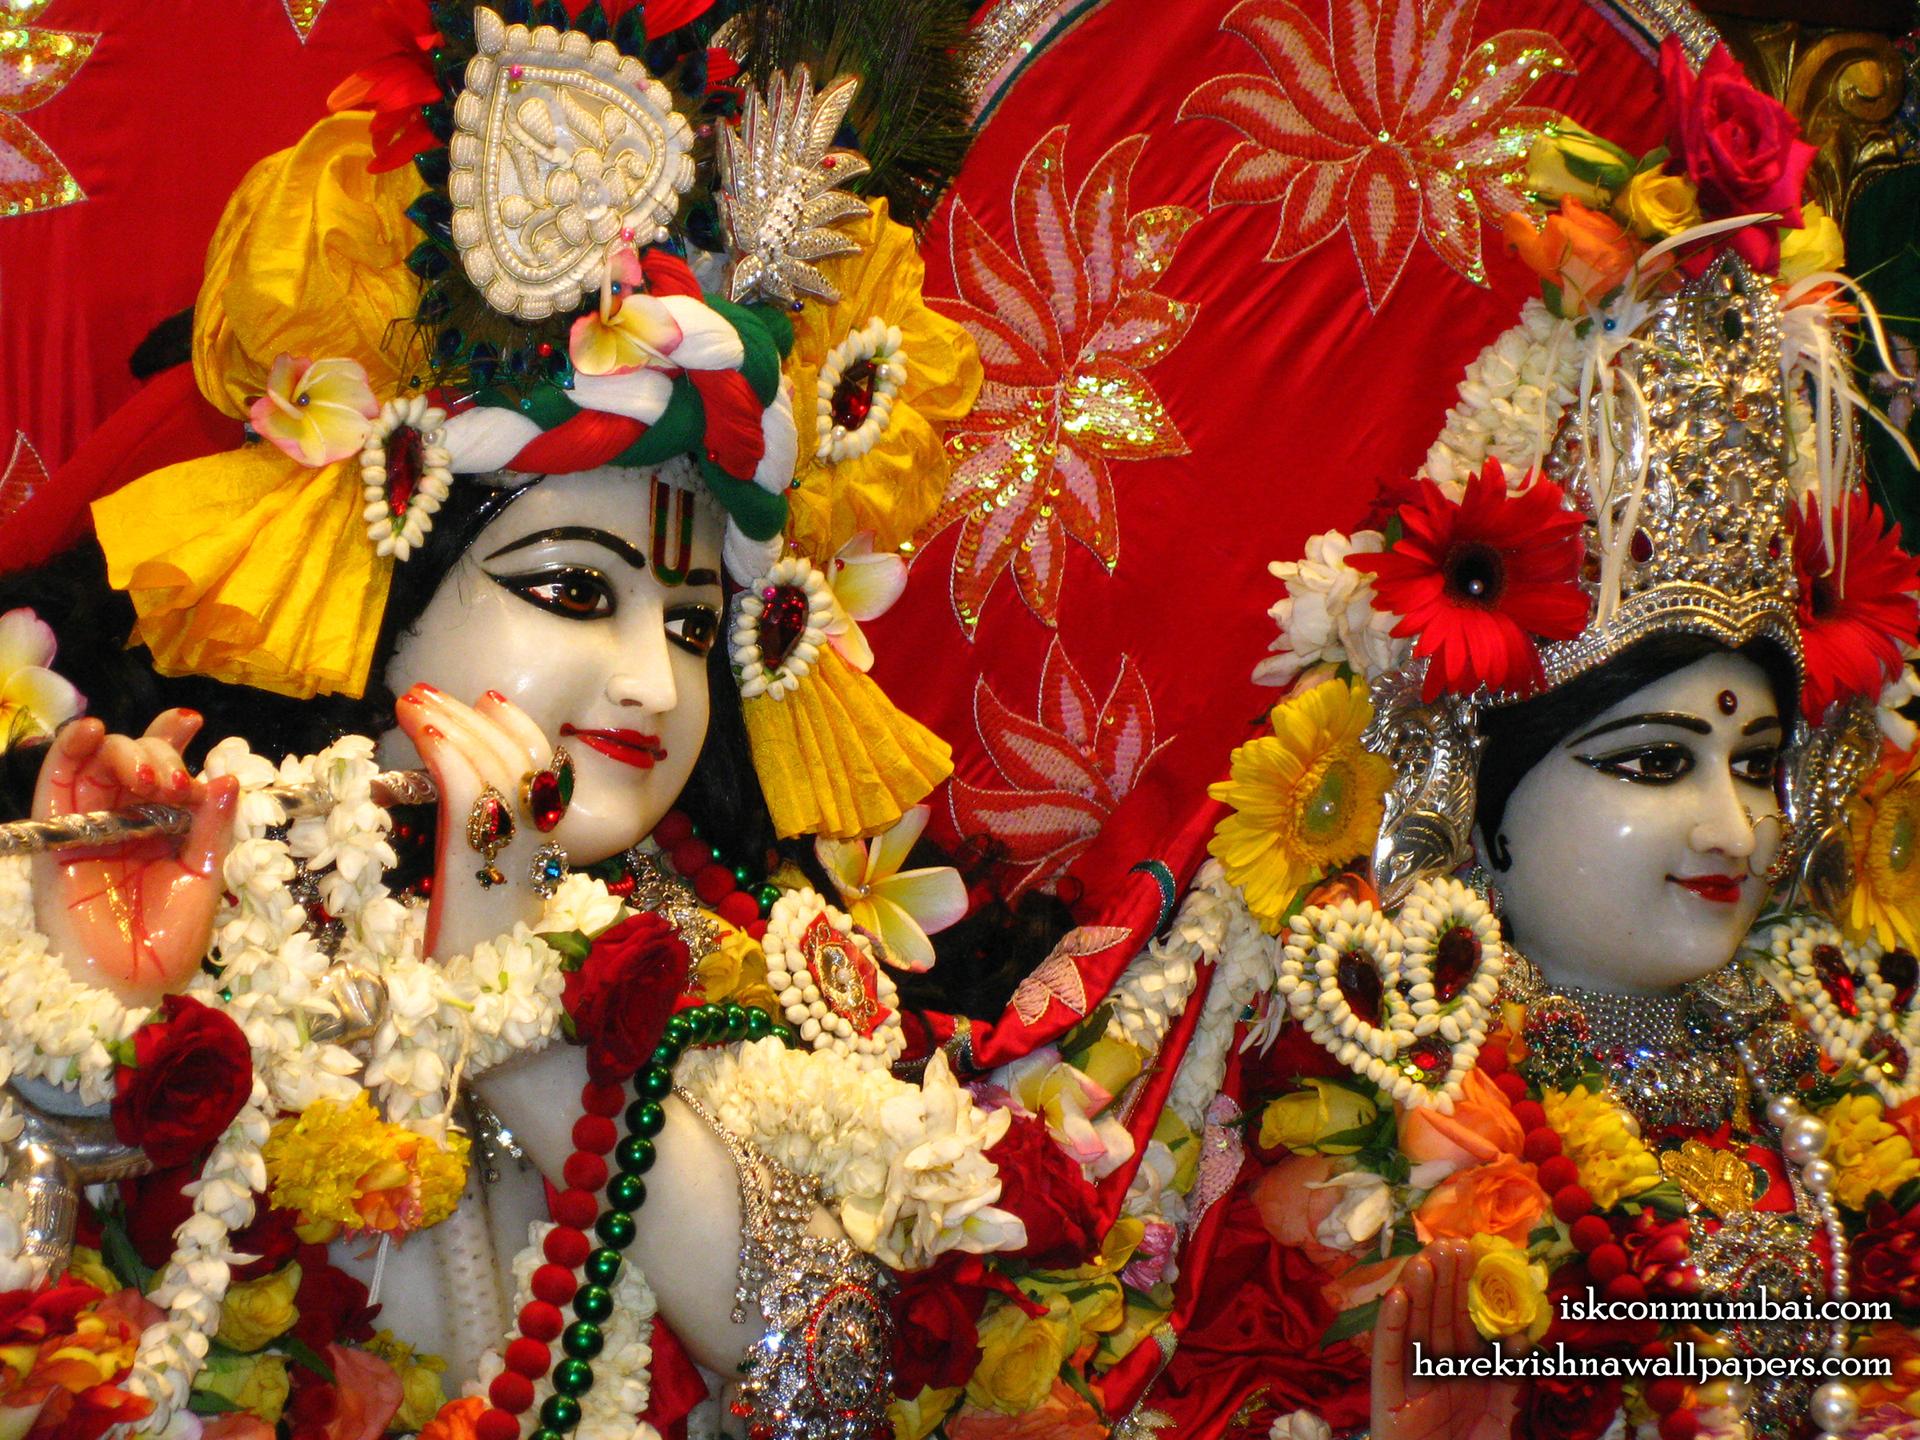 Sri Sri Radha Rasabihari Close up Wallpaper (026) Size 1920x1440 Download